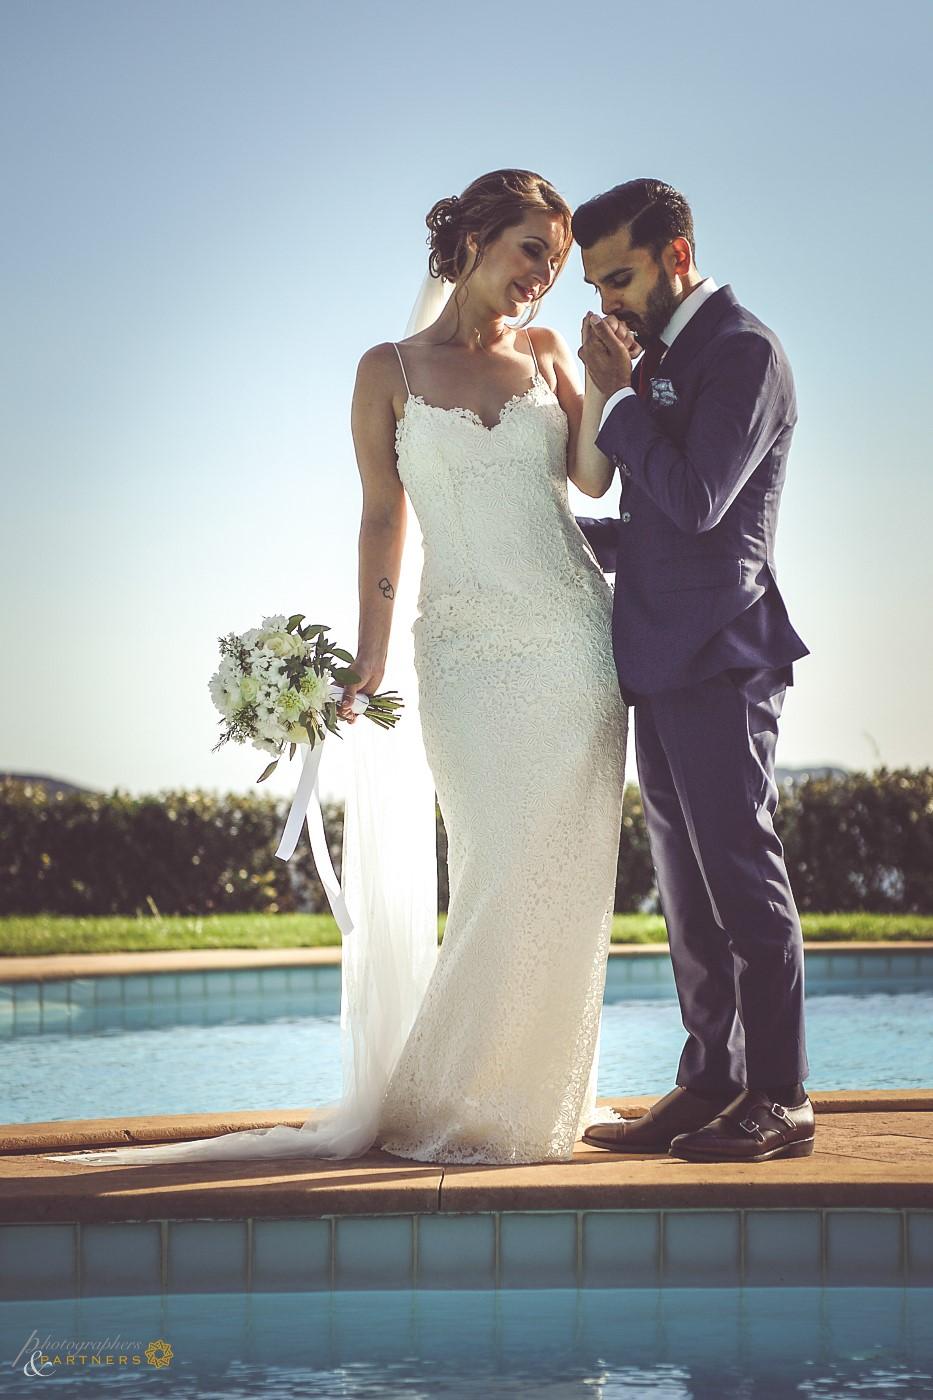 wedding_photos_tenuta_quadrifoglio_17.jpg